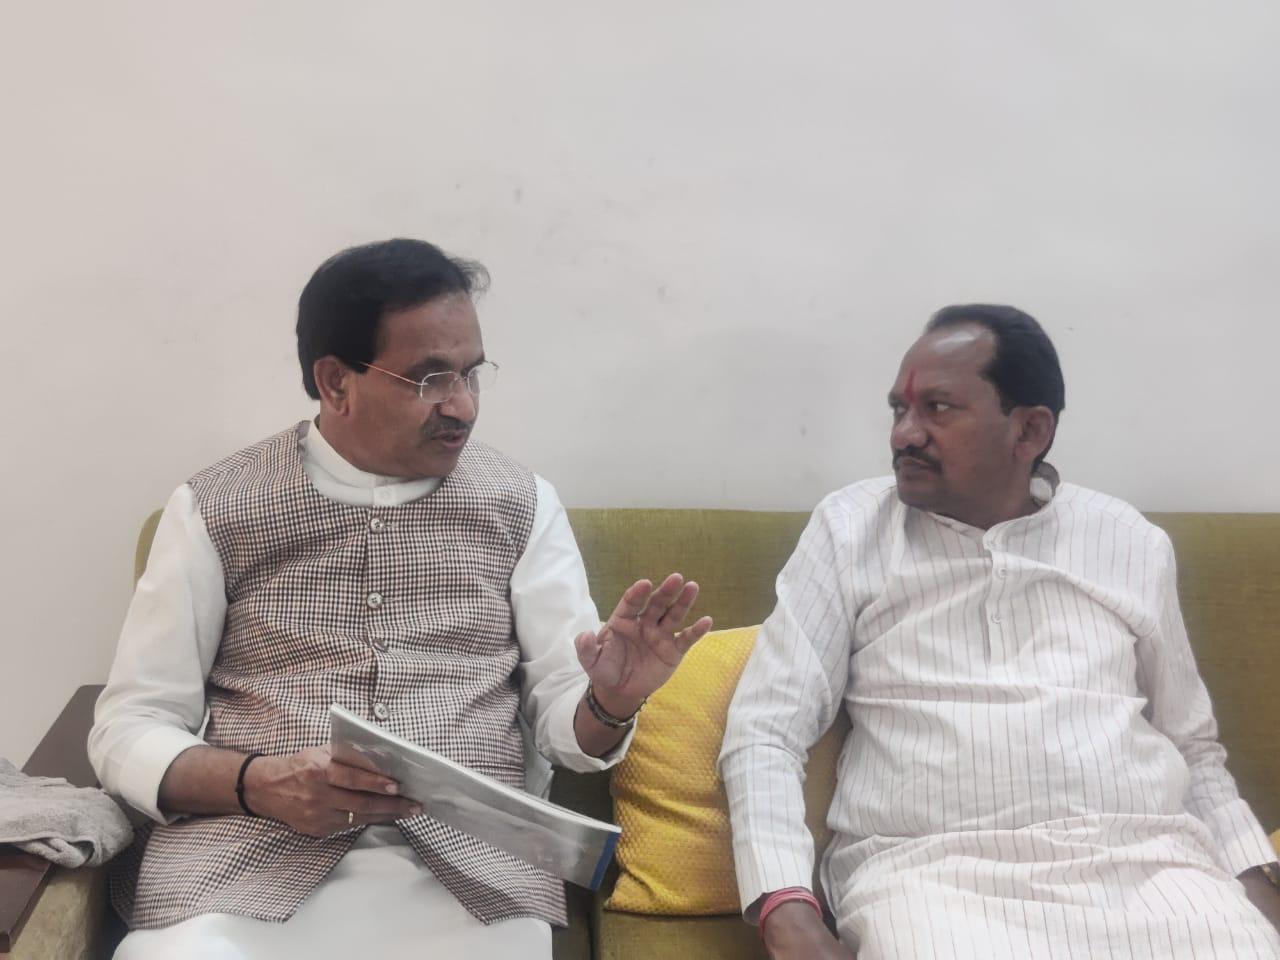 Prabhu Chavan meets Bhagawant Khuba